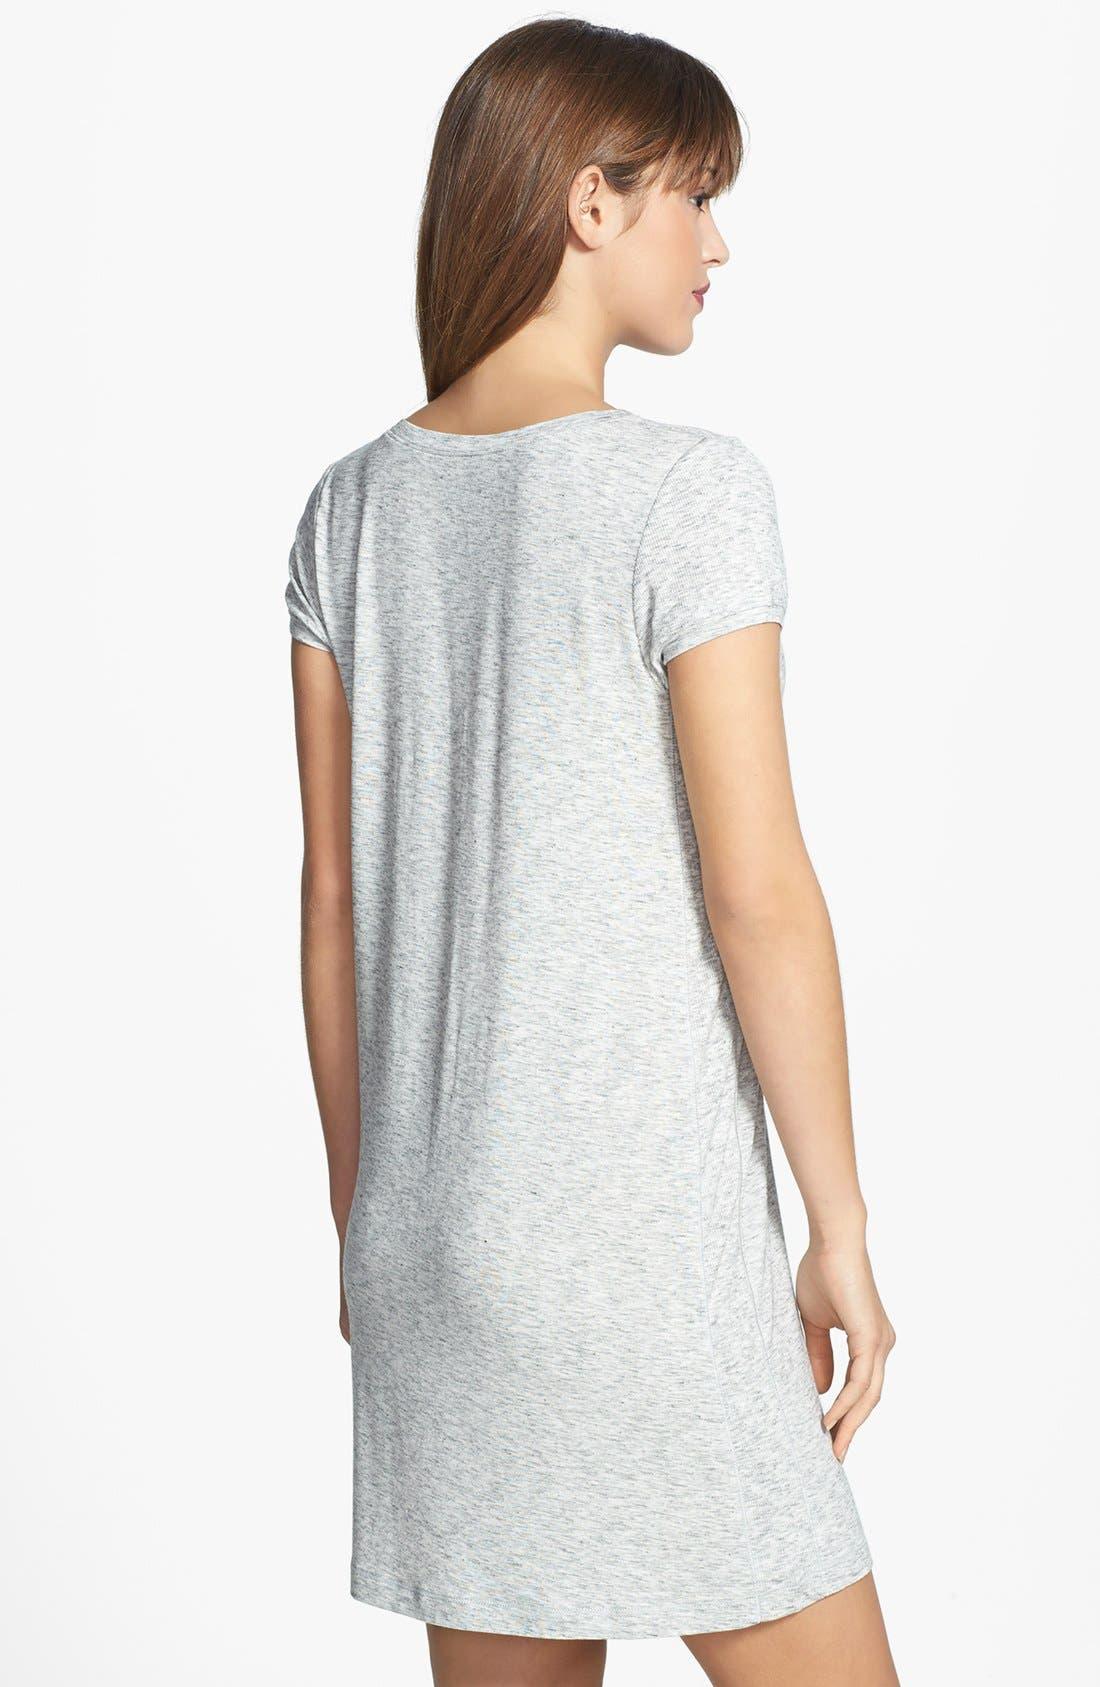 Alternate Image 2  - DKNY 'City Essentials' V-Neck Sleep Shirt